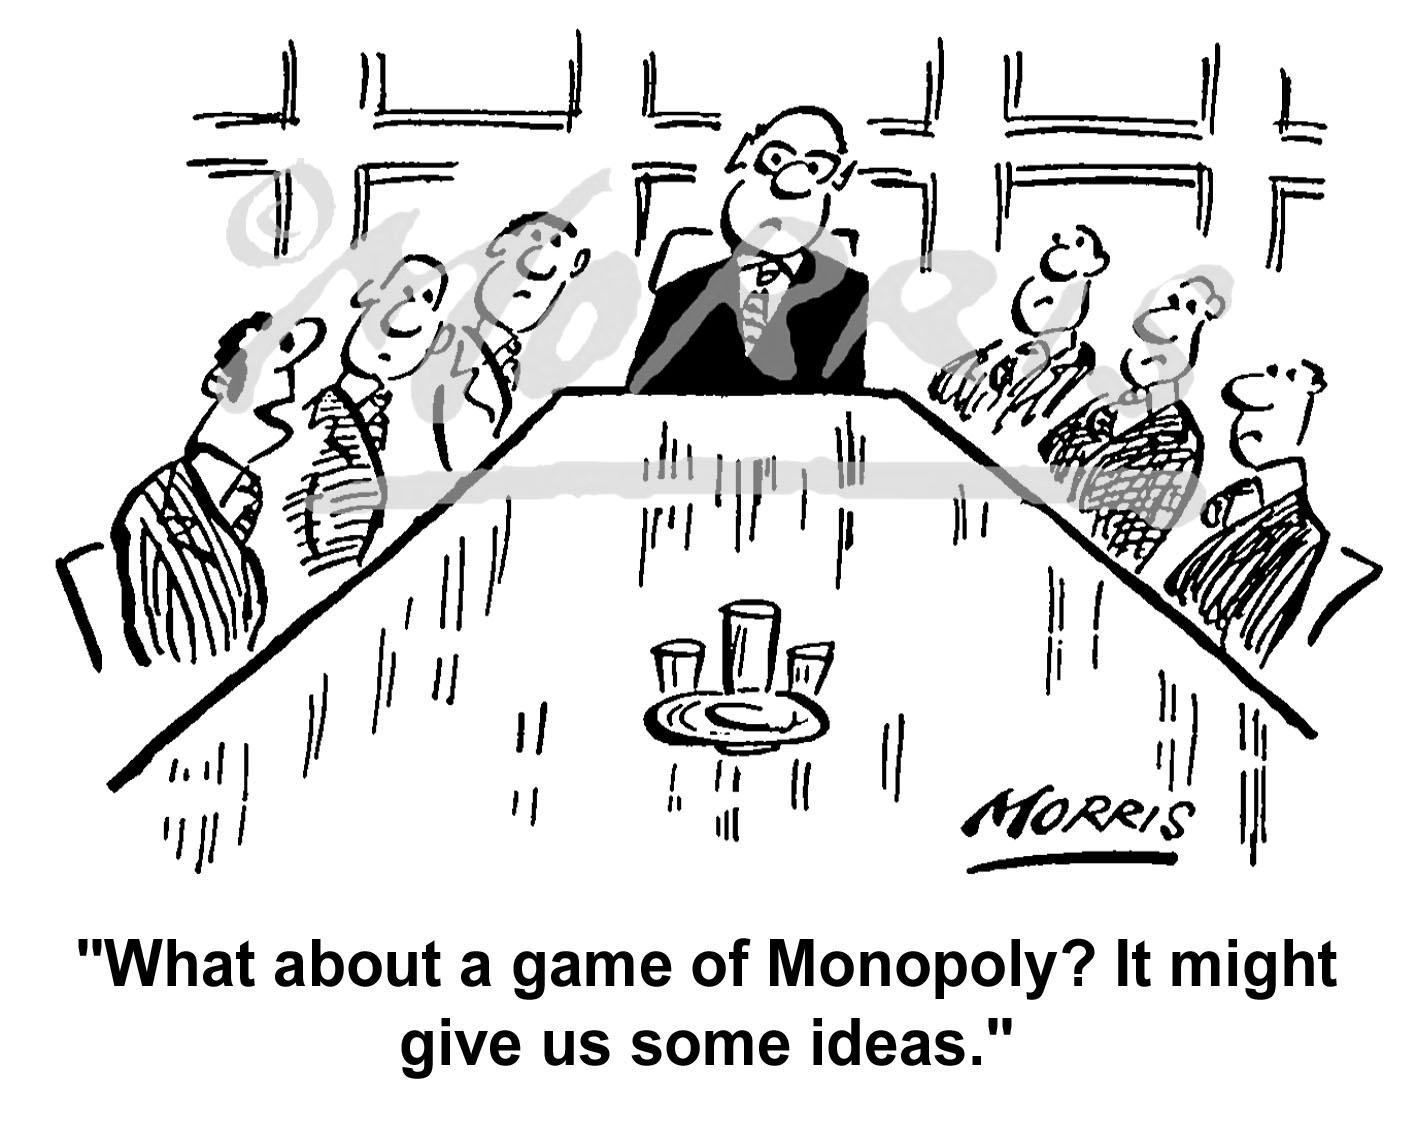 Boardroom meeting cartoon Ref: 1391bw